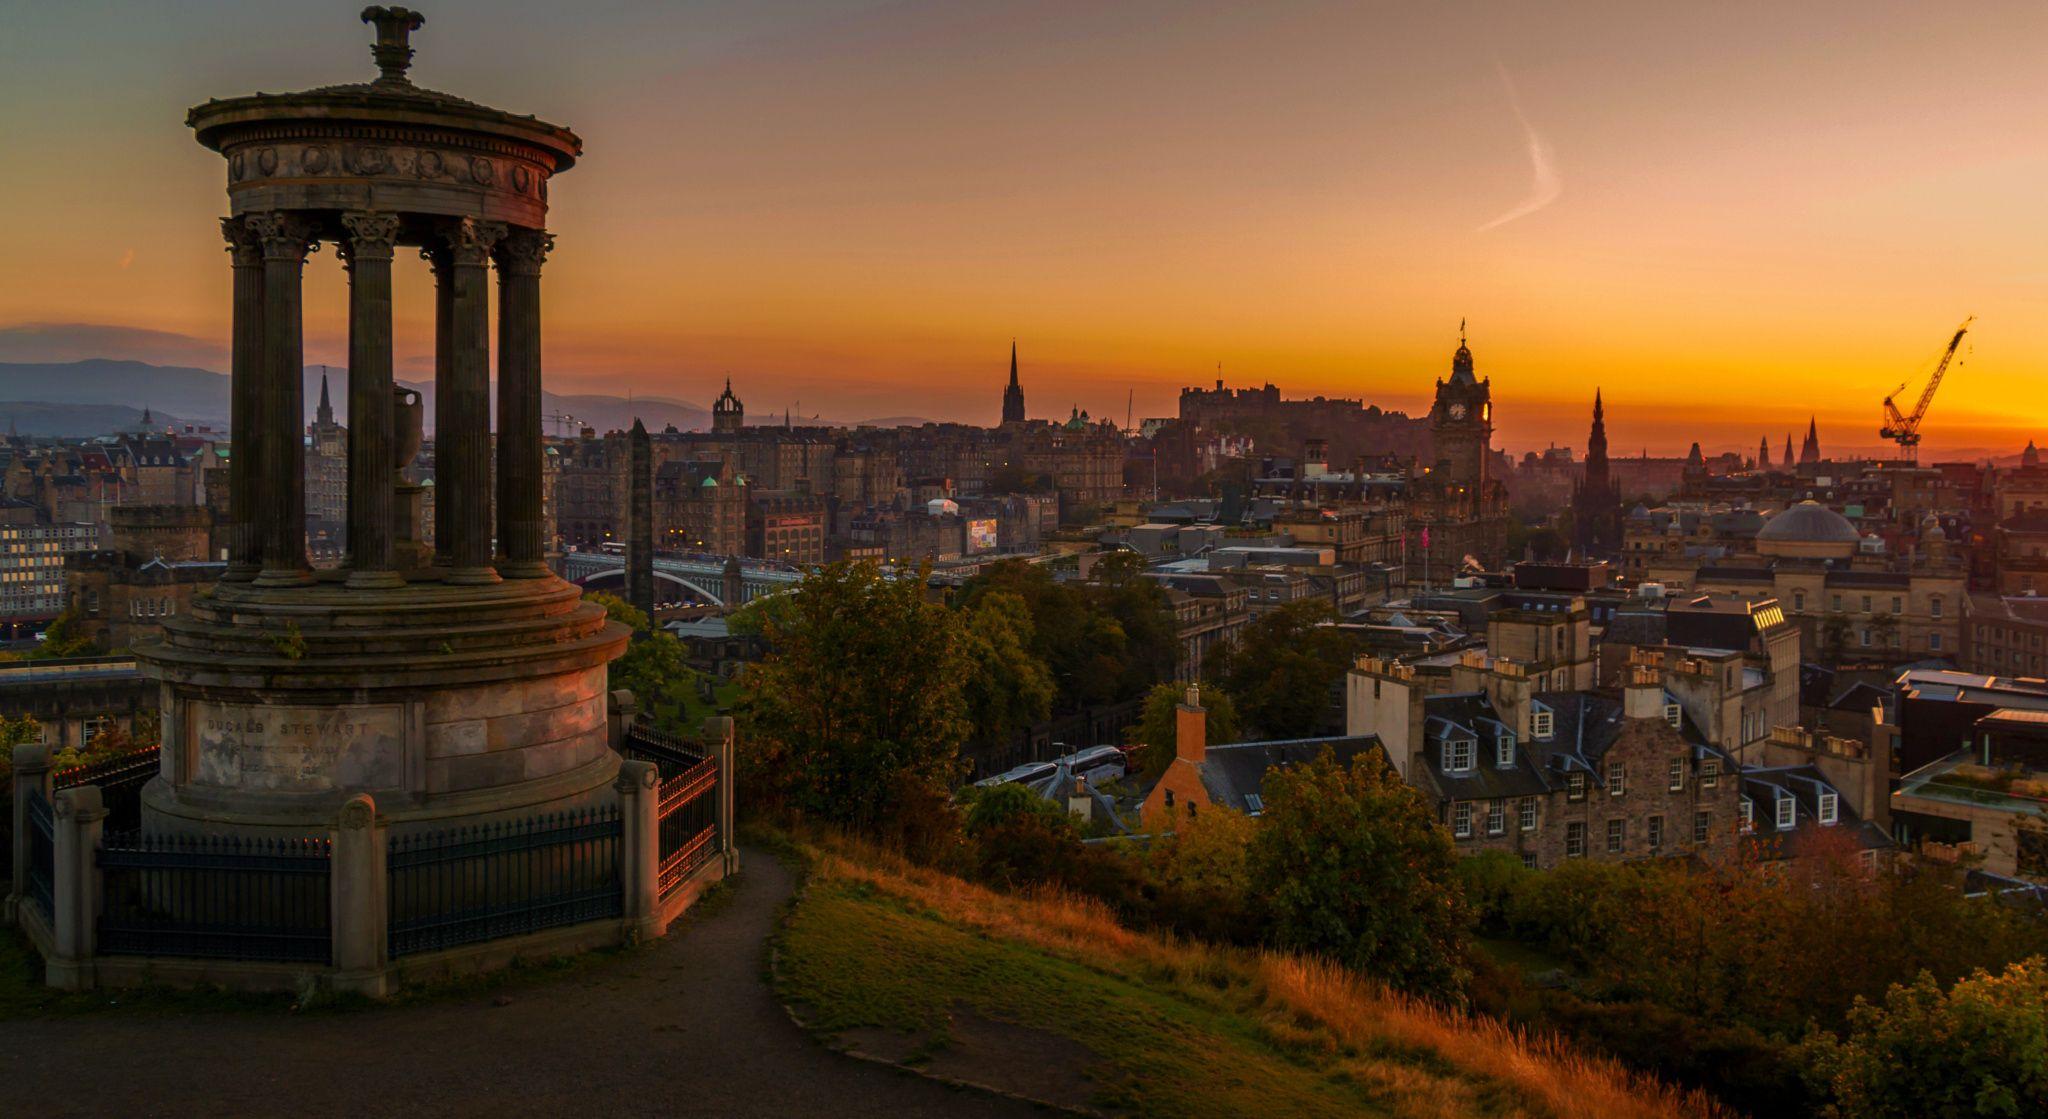 Sunset Over Edinburgh The Dugald Stewart Monument Is A Memorial